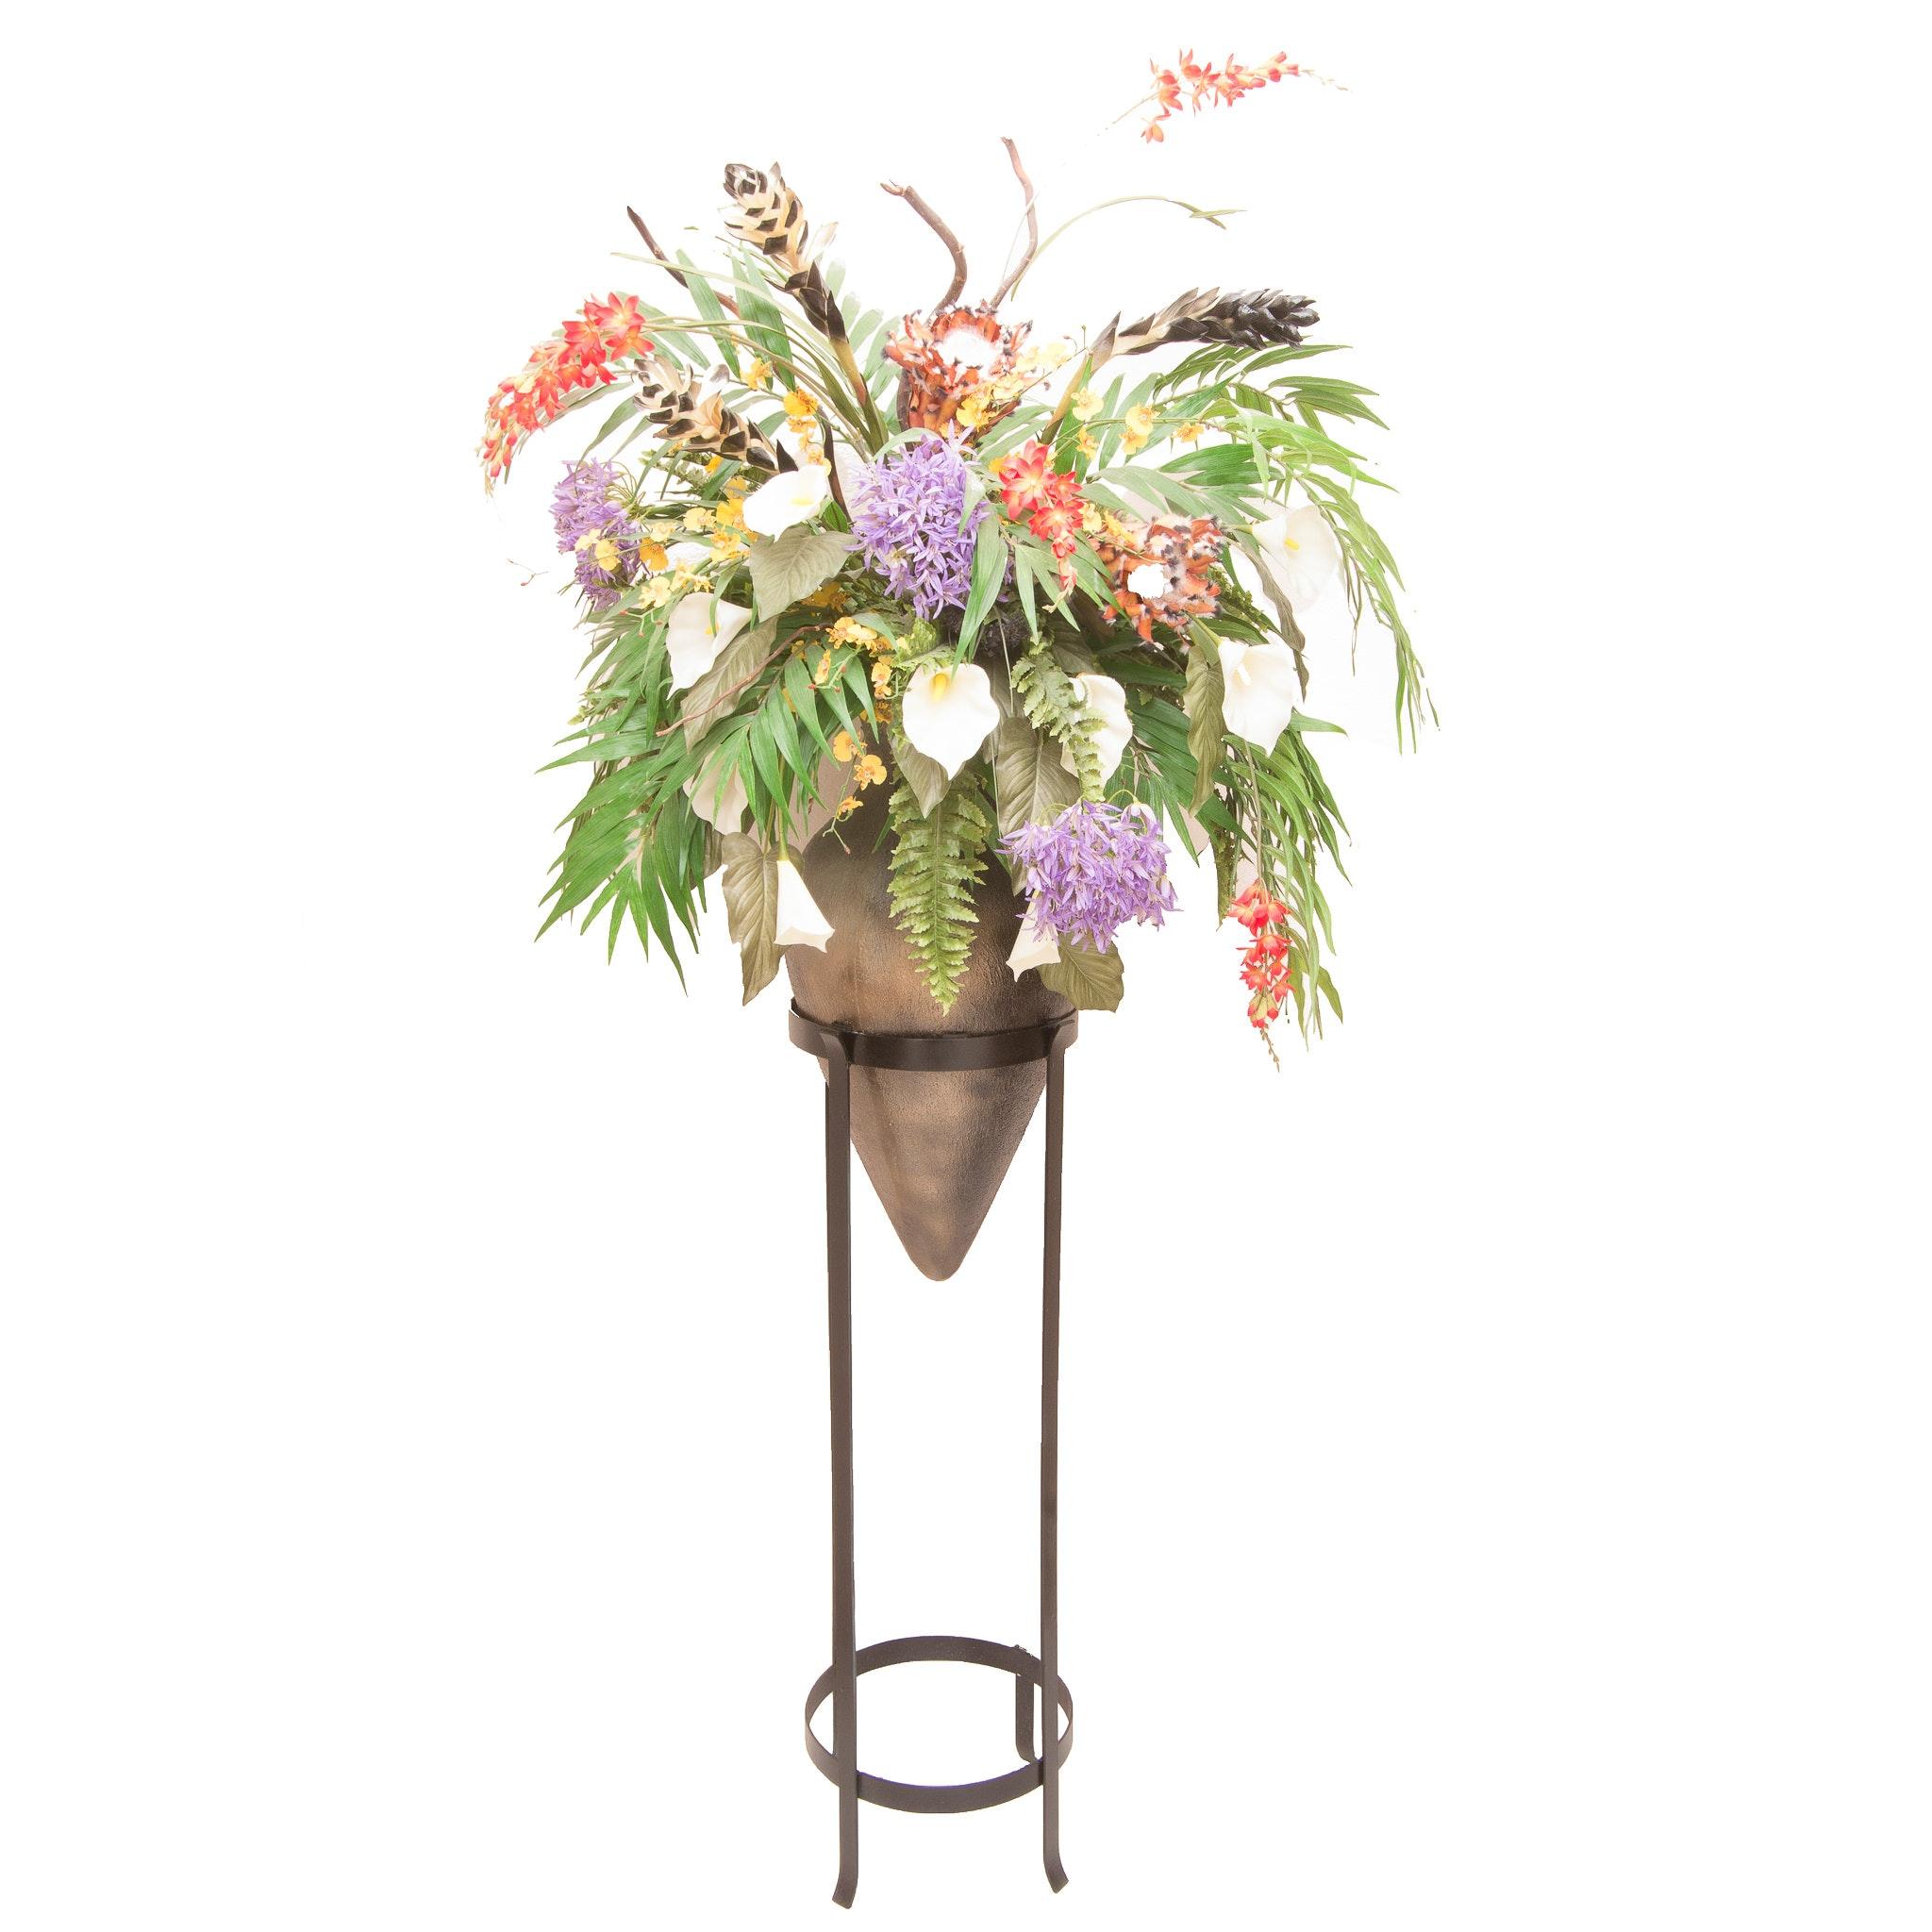 Large Metal Base Planter and Artificial Flower Arrangement